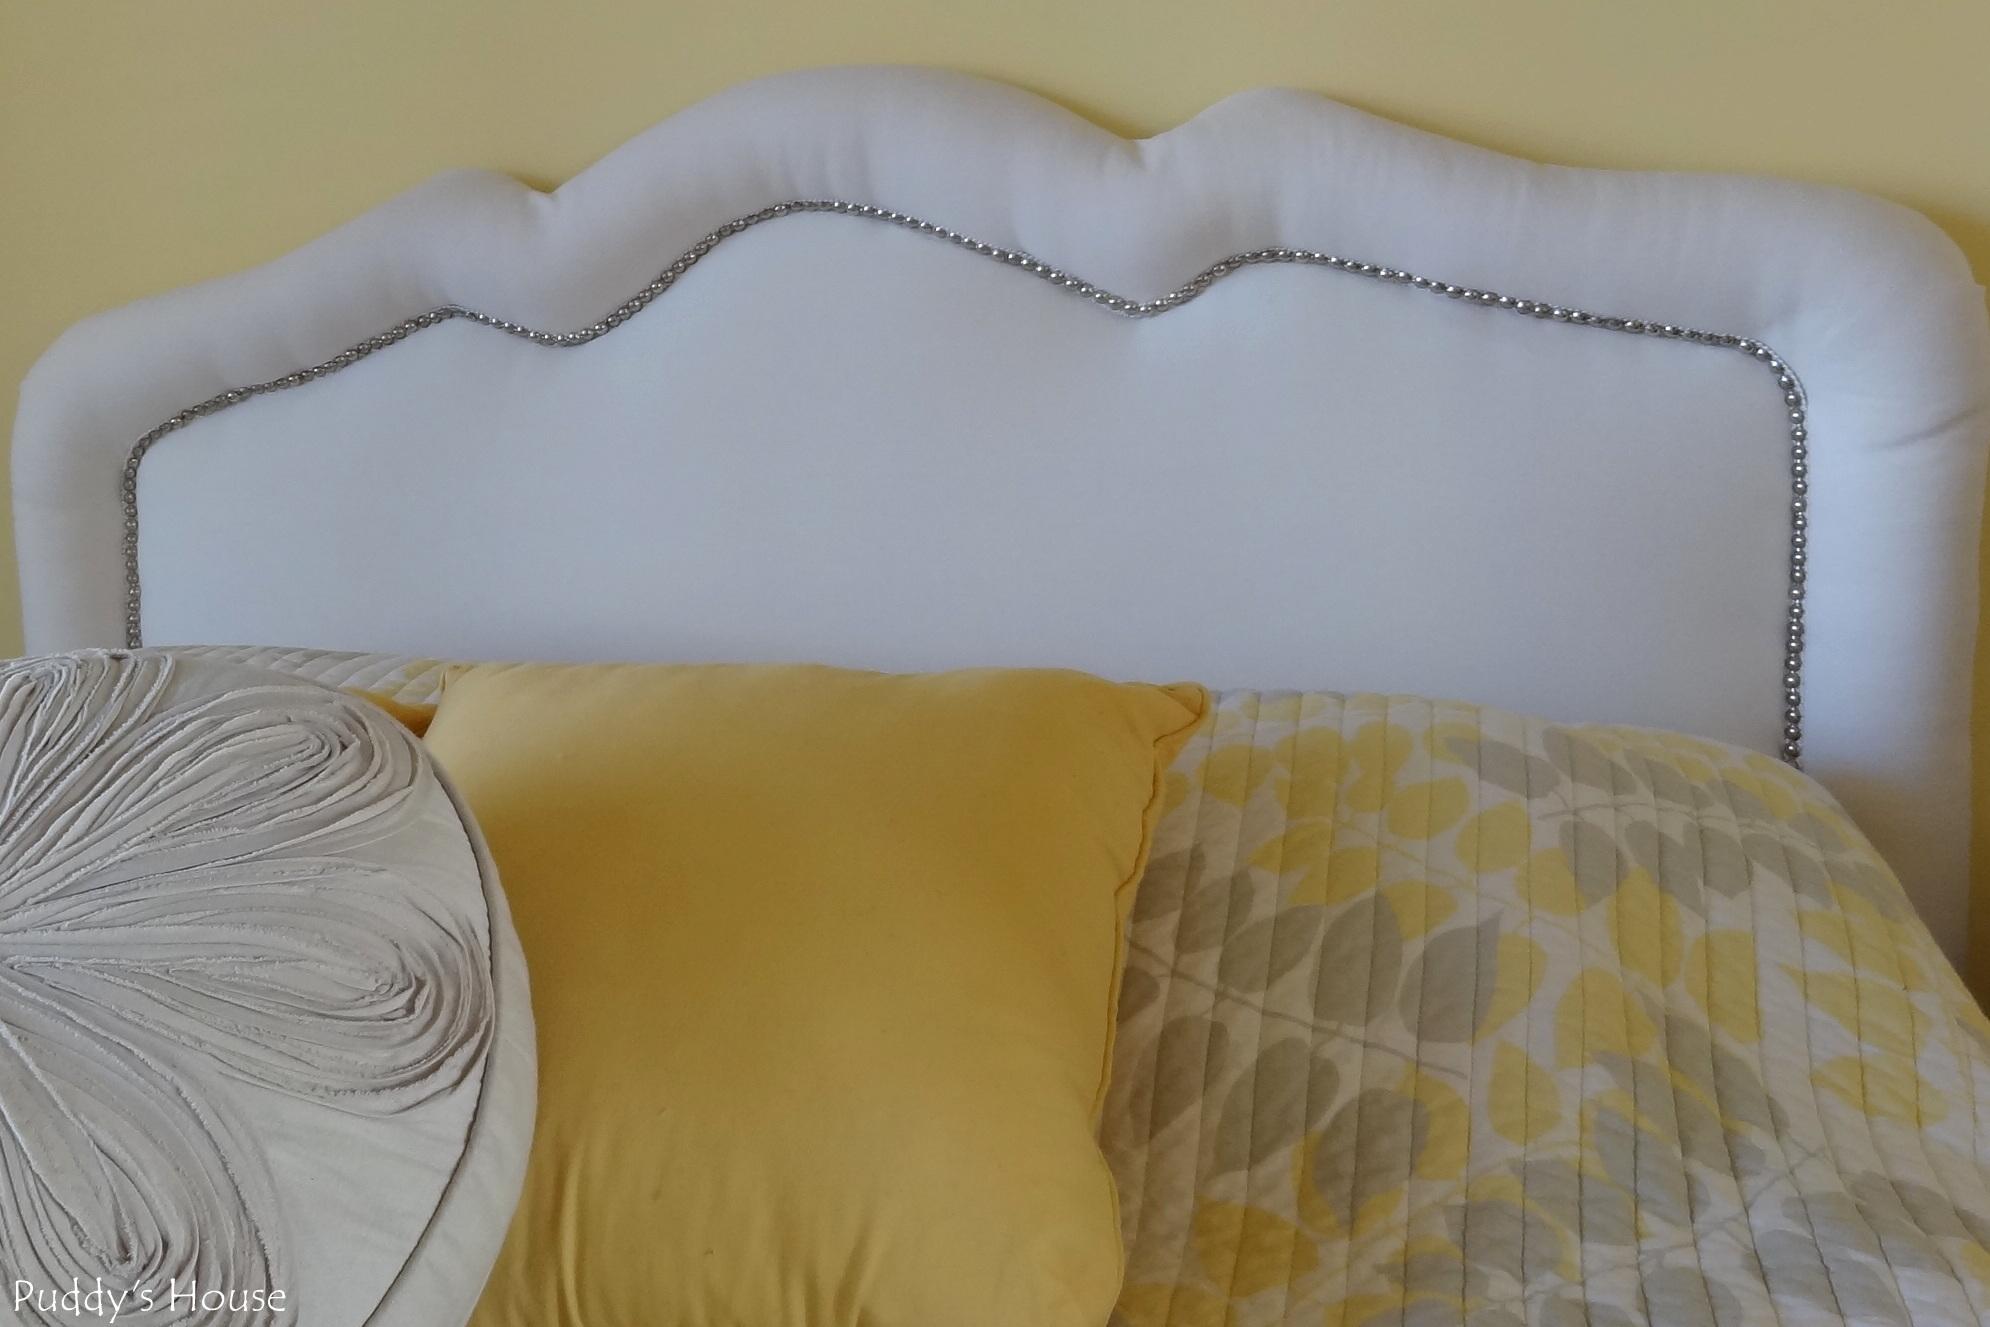 Upholstered Headboard With Nailhead Trim - HomesFeed